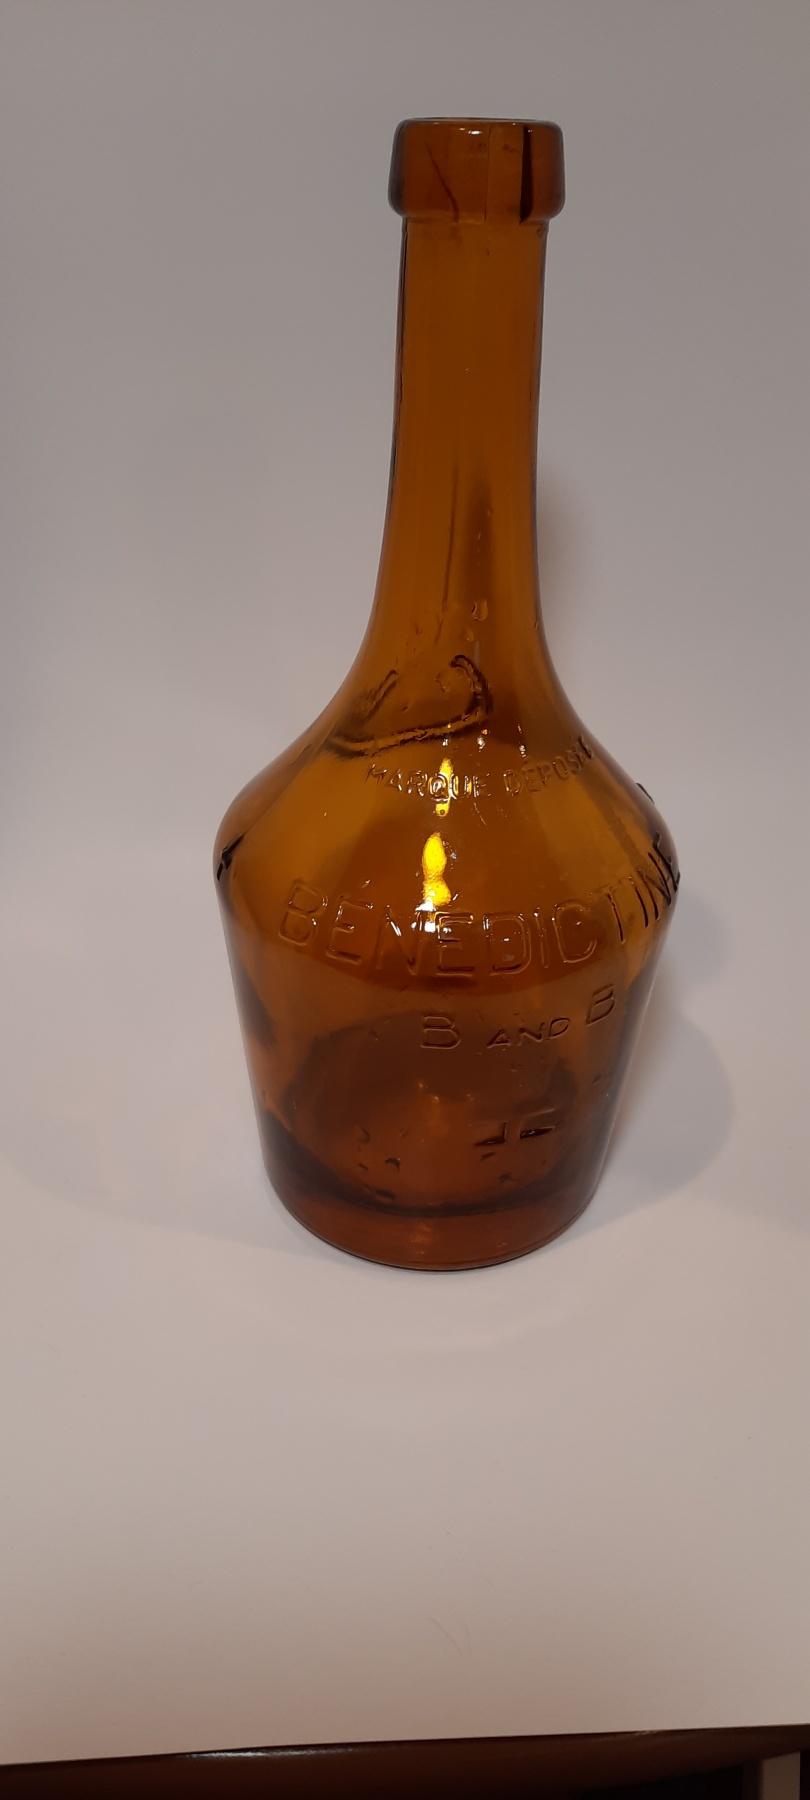 B&B bottle 1.jpg